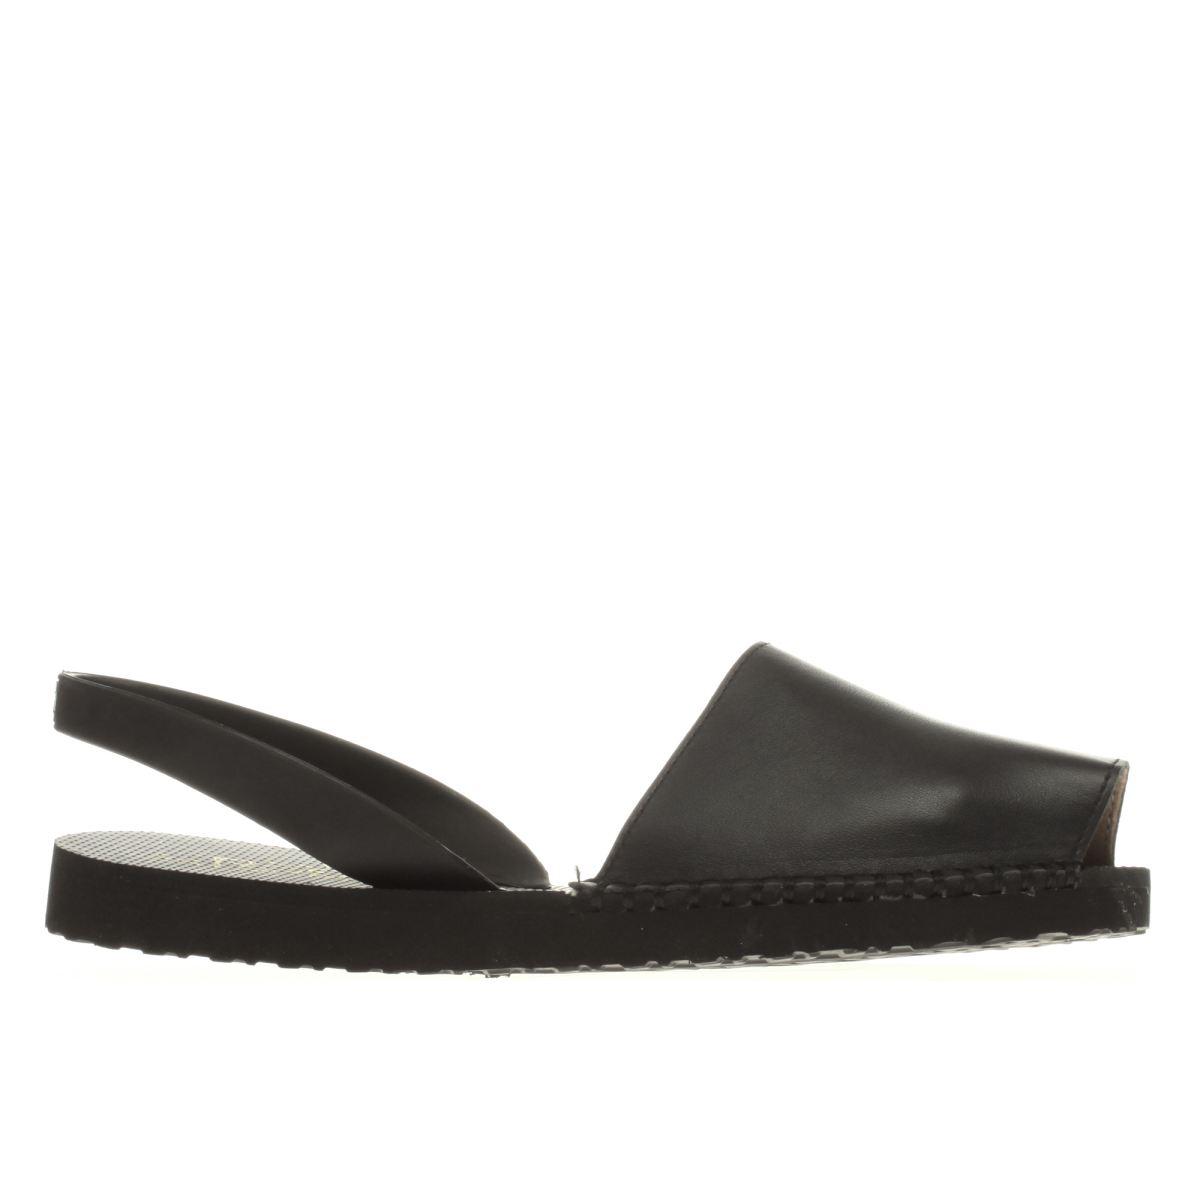 espadilla black balearic sandals